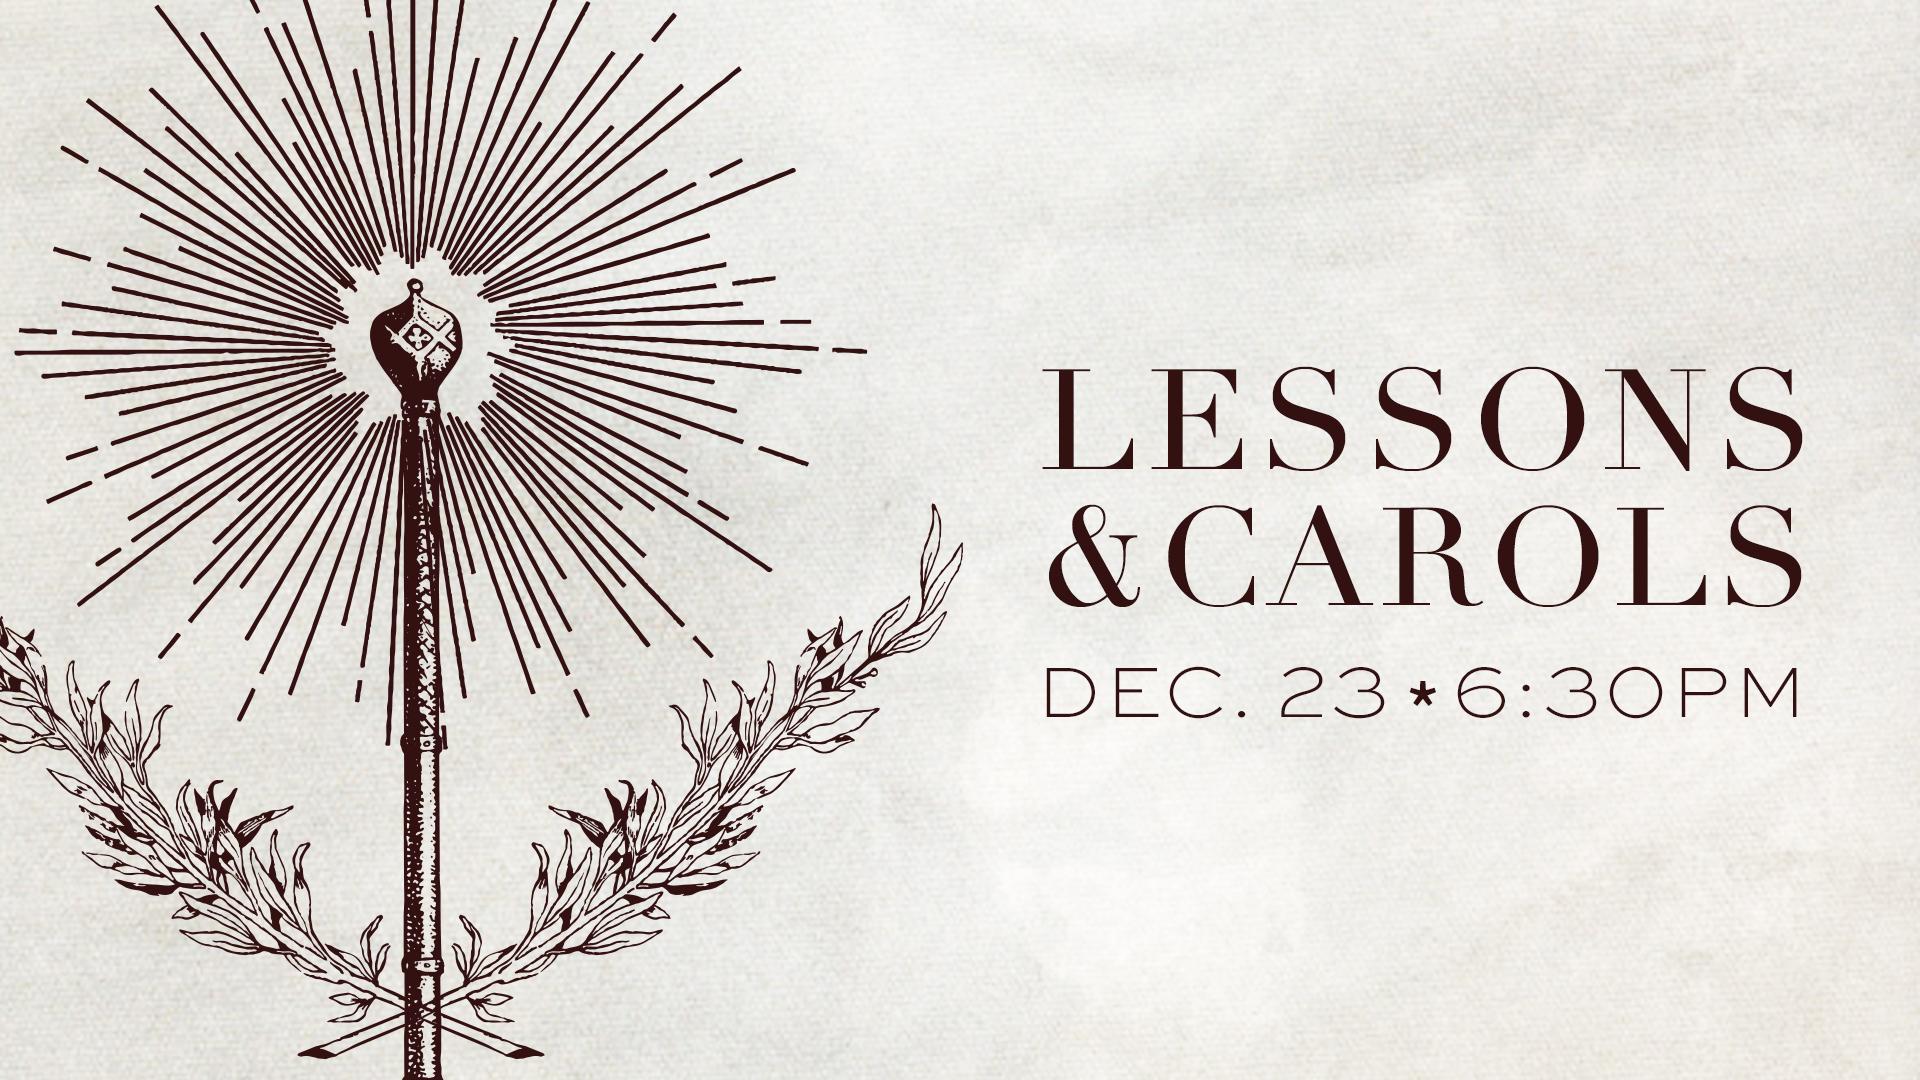 Lessons and Carols.jpg